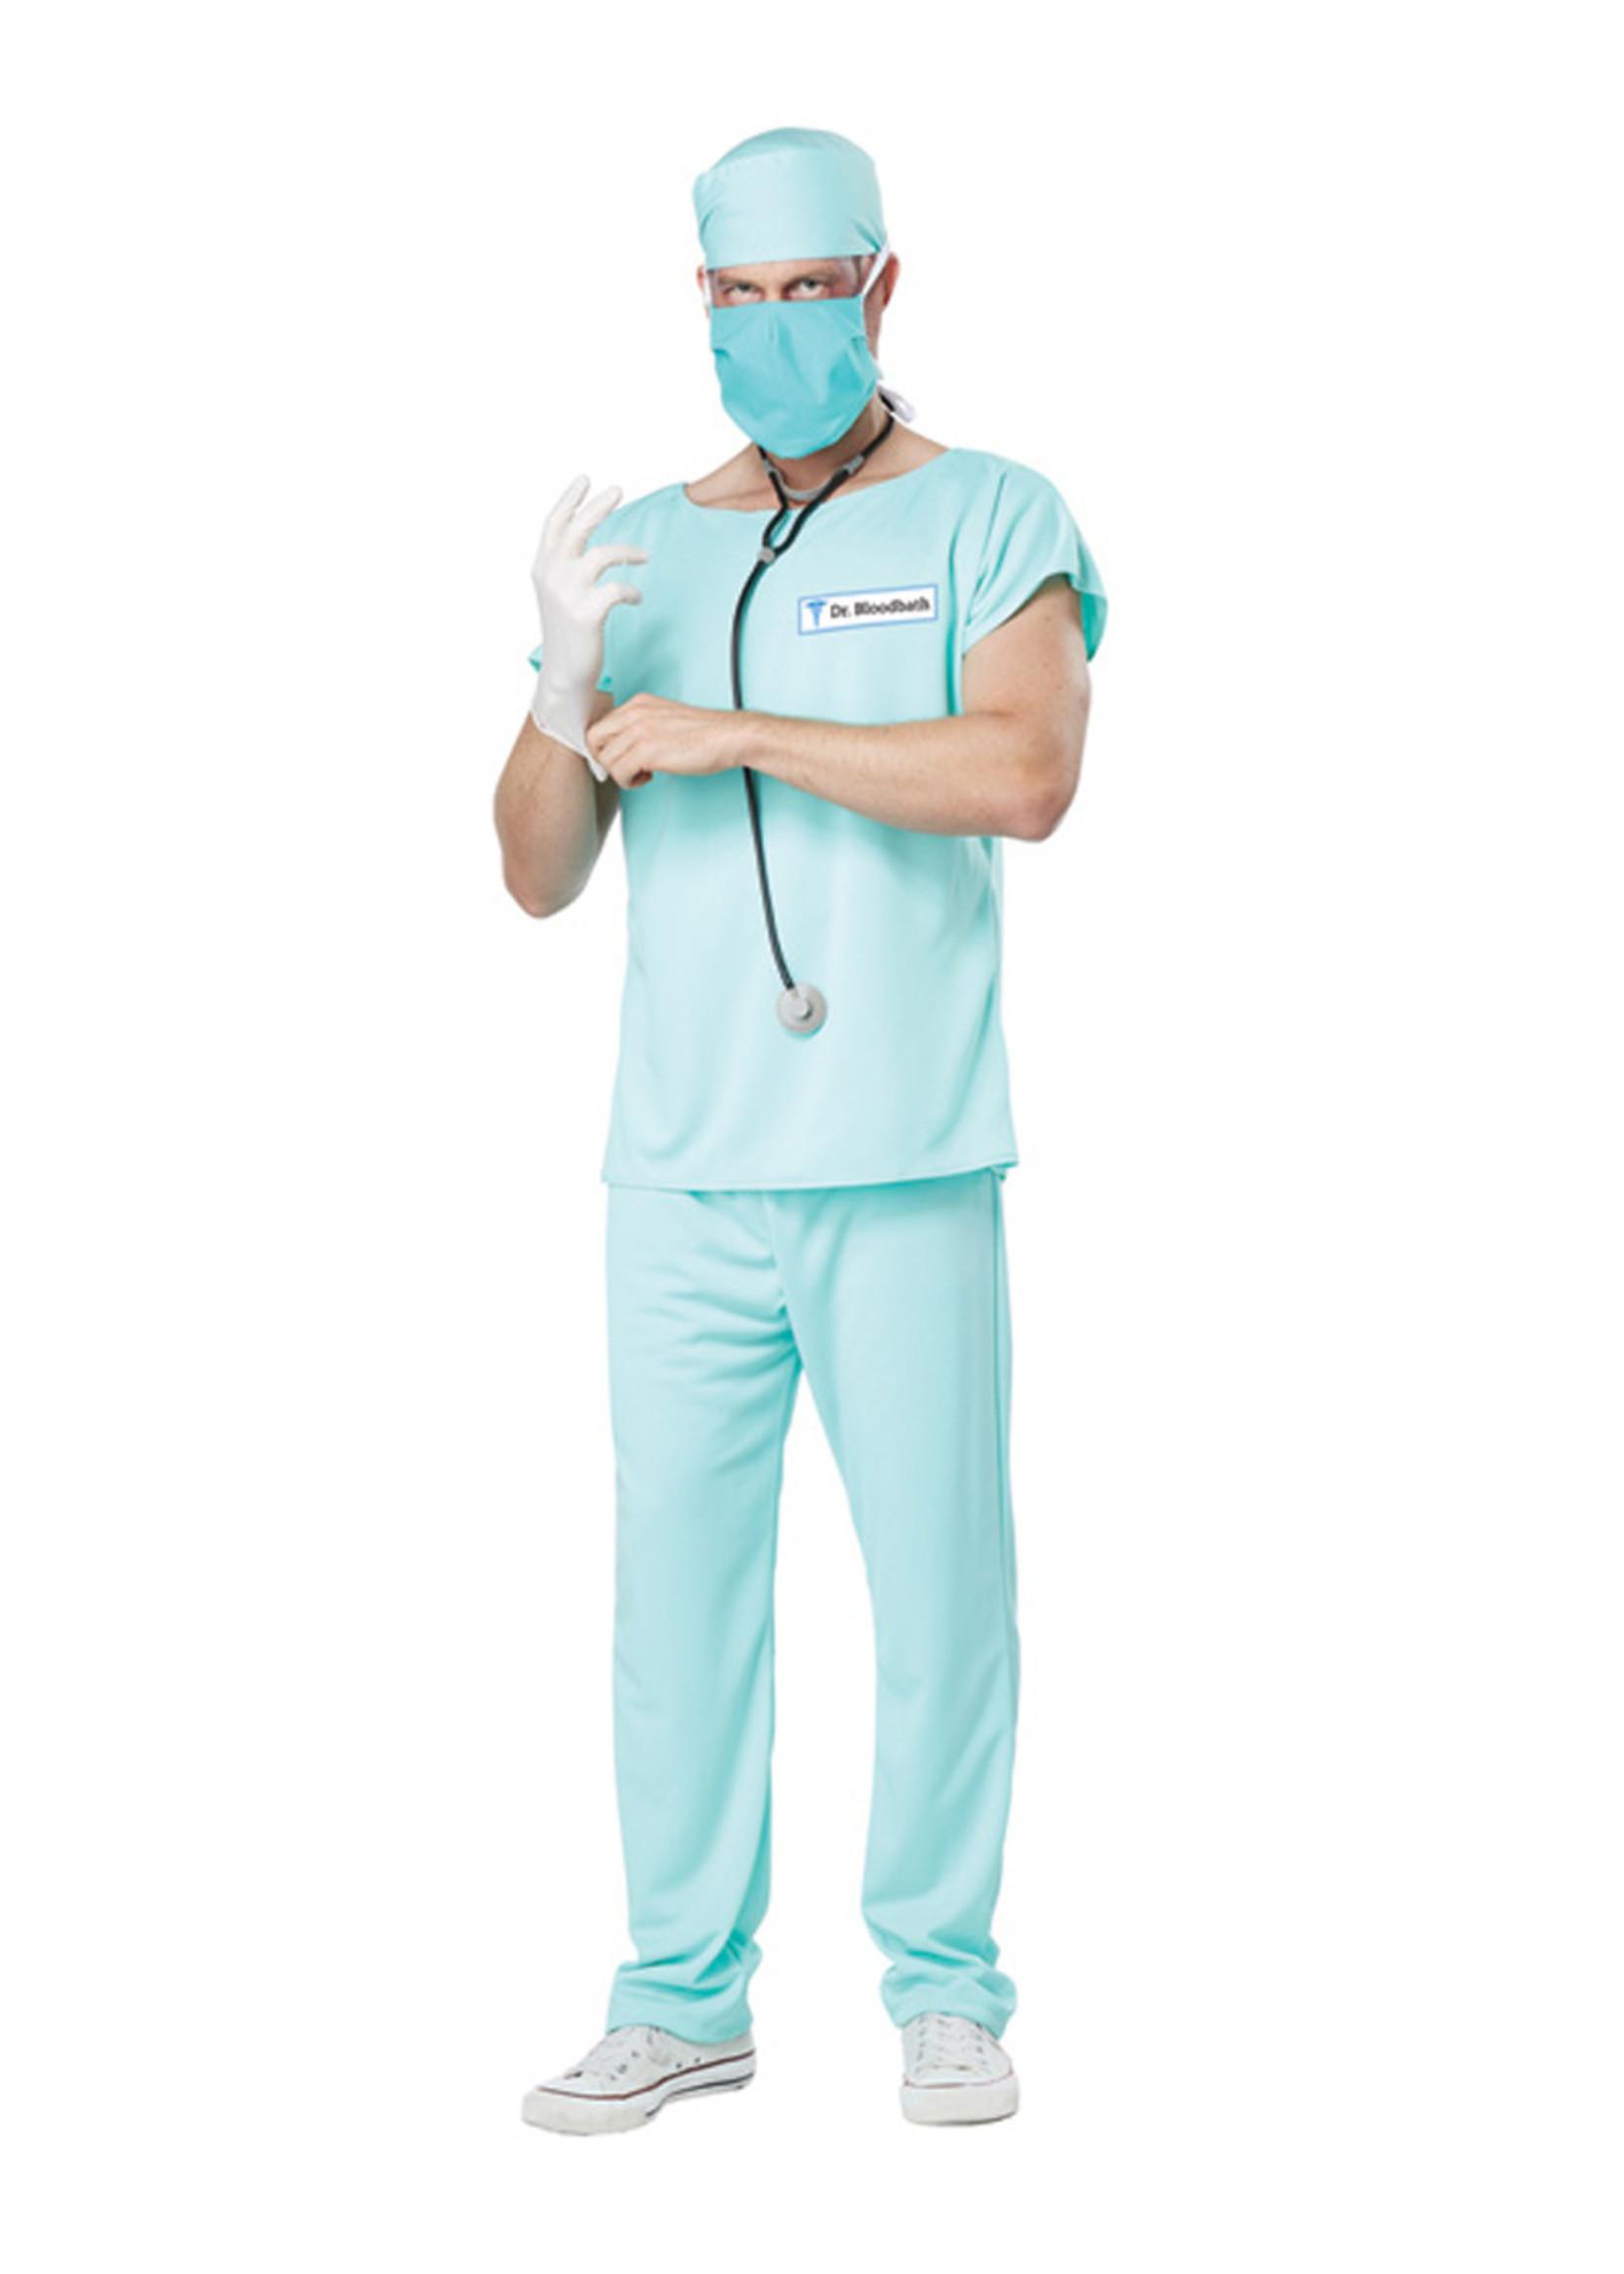 Dr. Bloodbath Costume - Men's